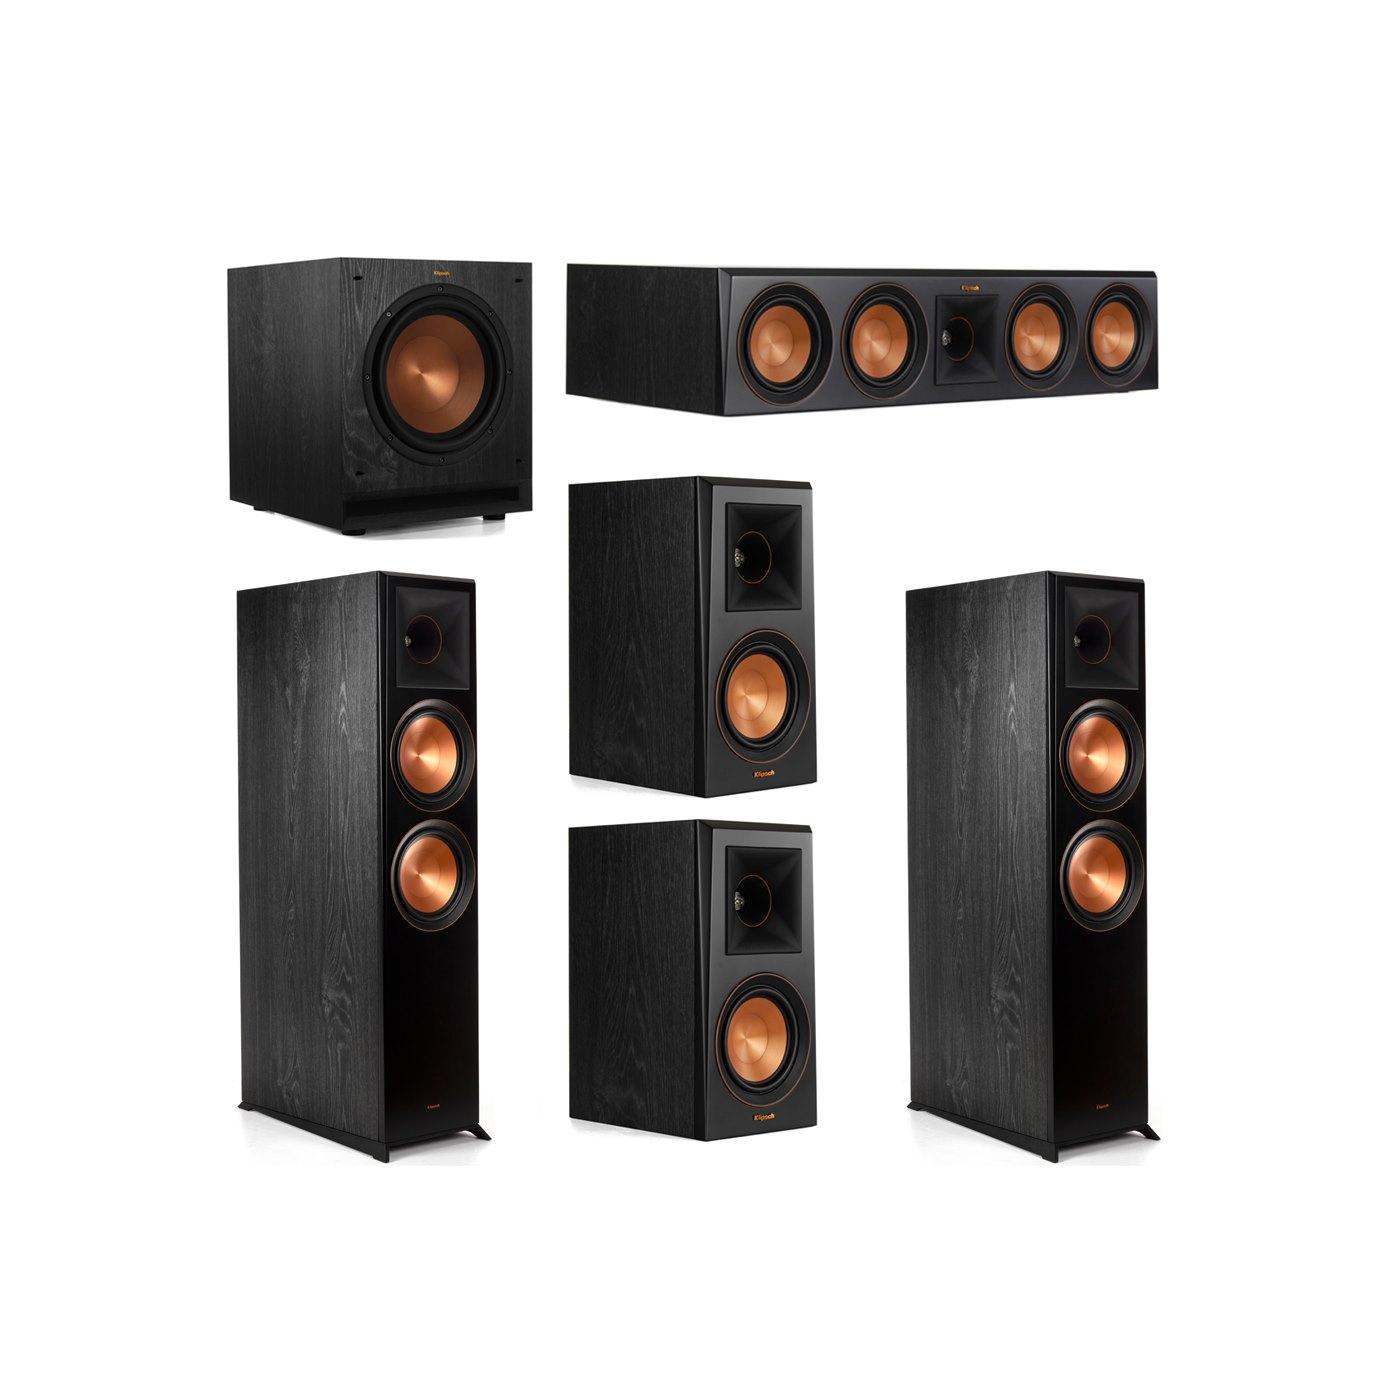 Klipsch 5.1 System with 2 RP-8000F Floorstanding Speakers, 1 Klipsch RP-504C Center Speaker, 2 Klipsch RP-500M Surround Speakers, 1 Klipsch SPL-100 Subwoofer